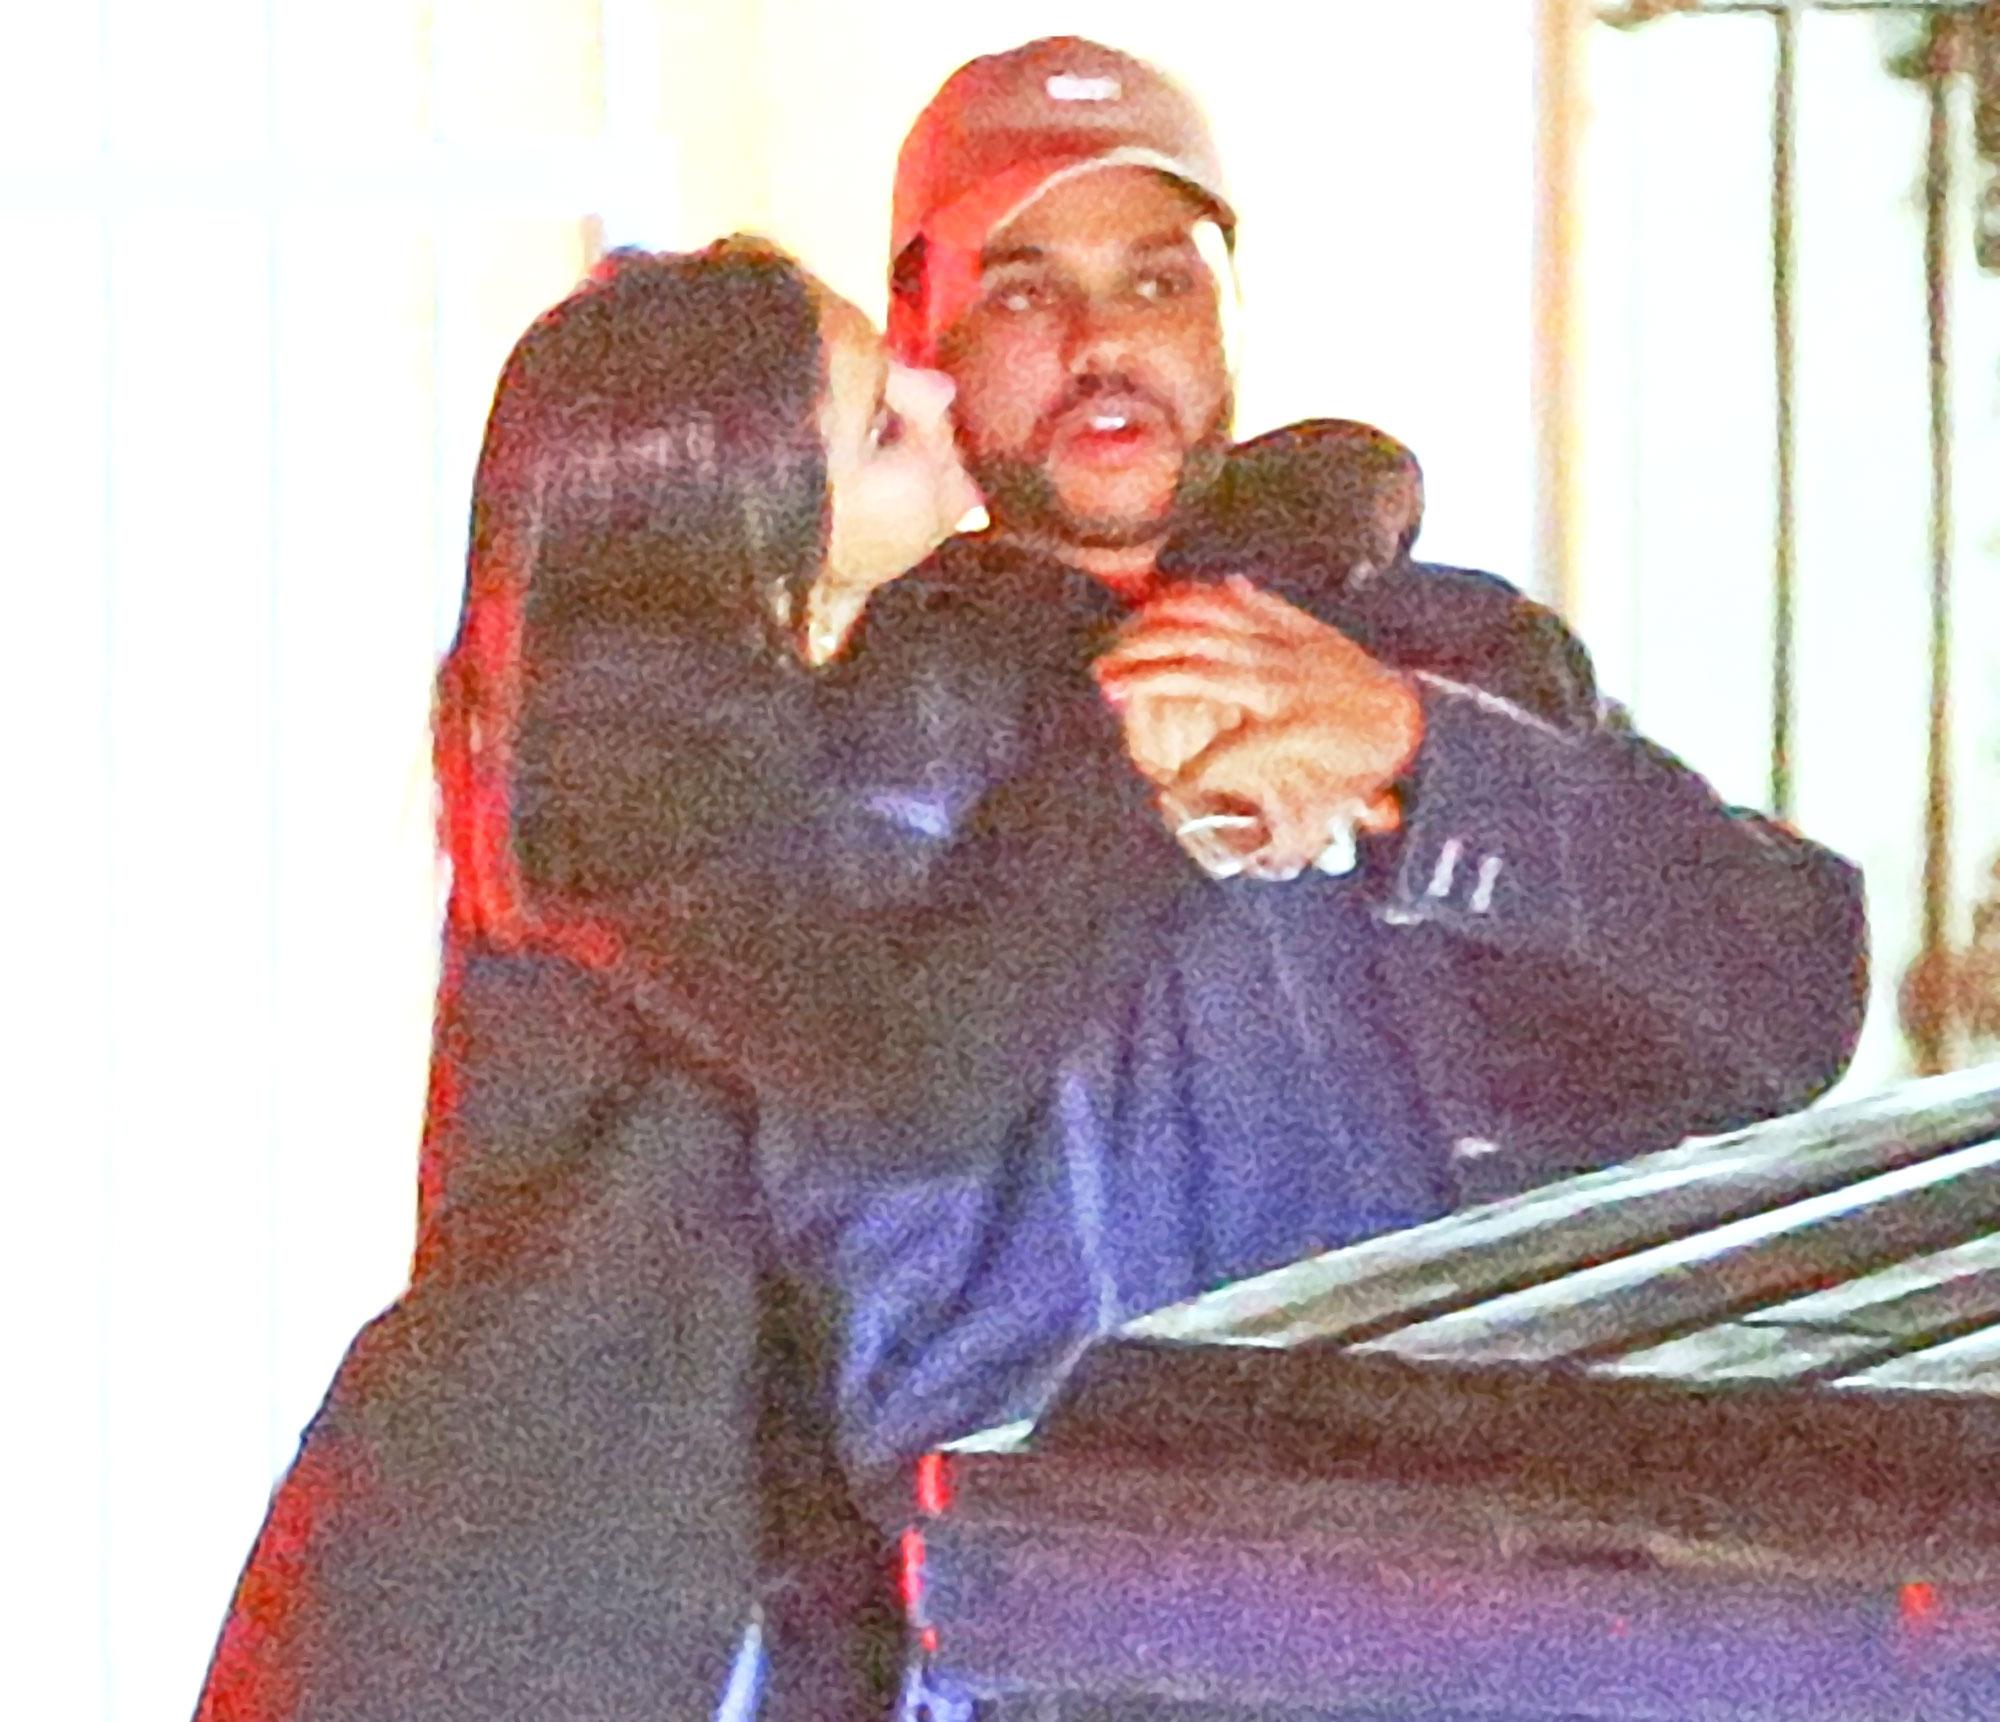 selena gomez bella hadid the weeknd romance couple love